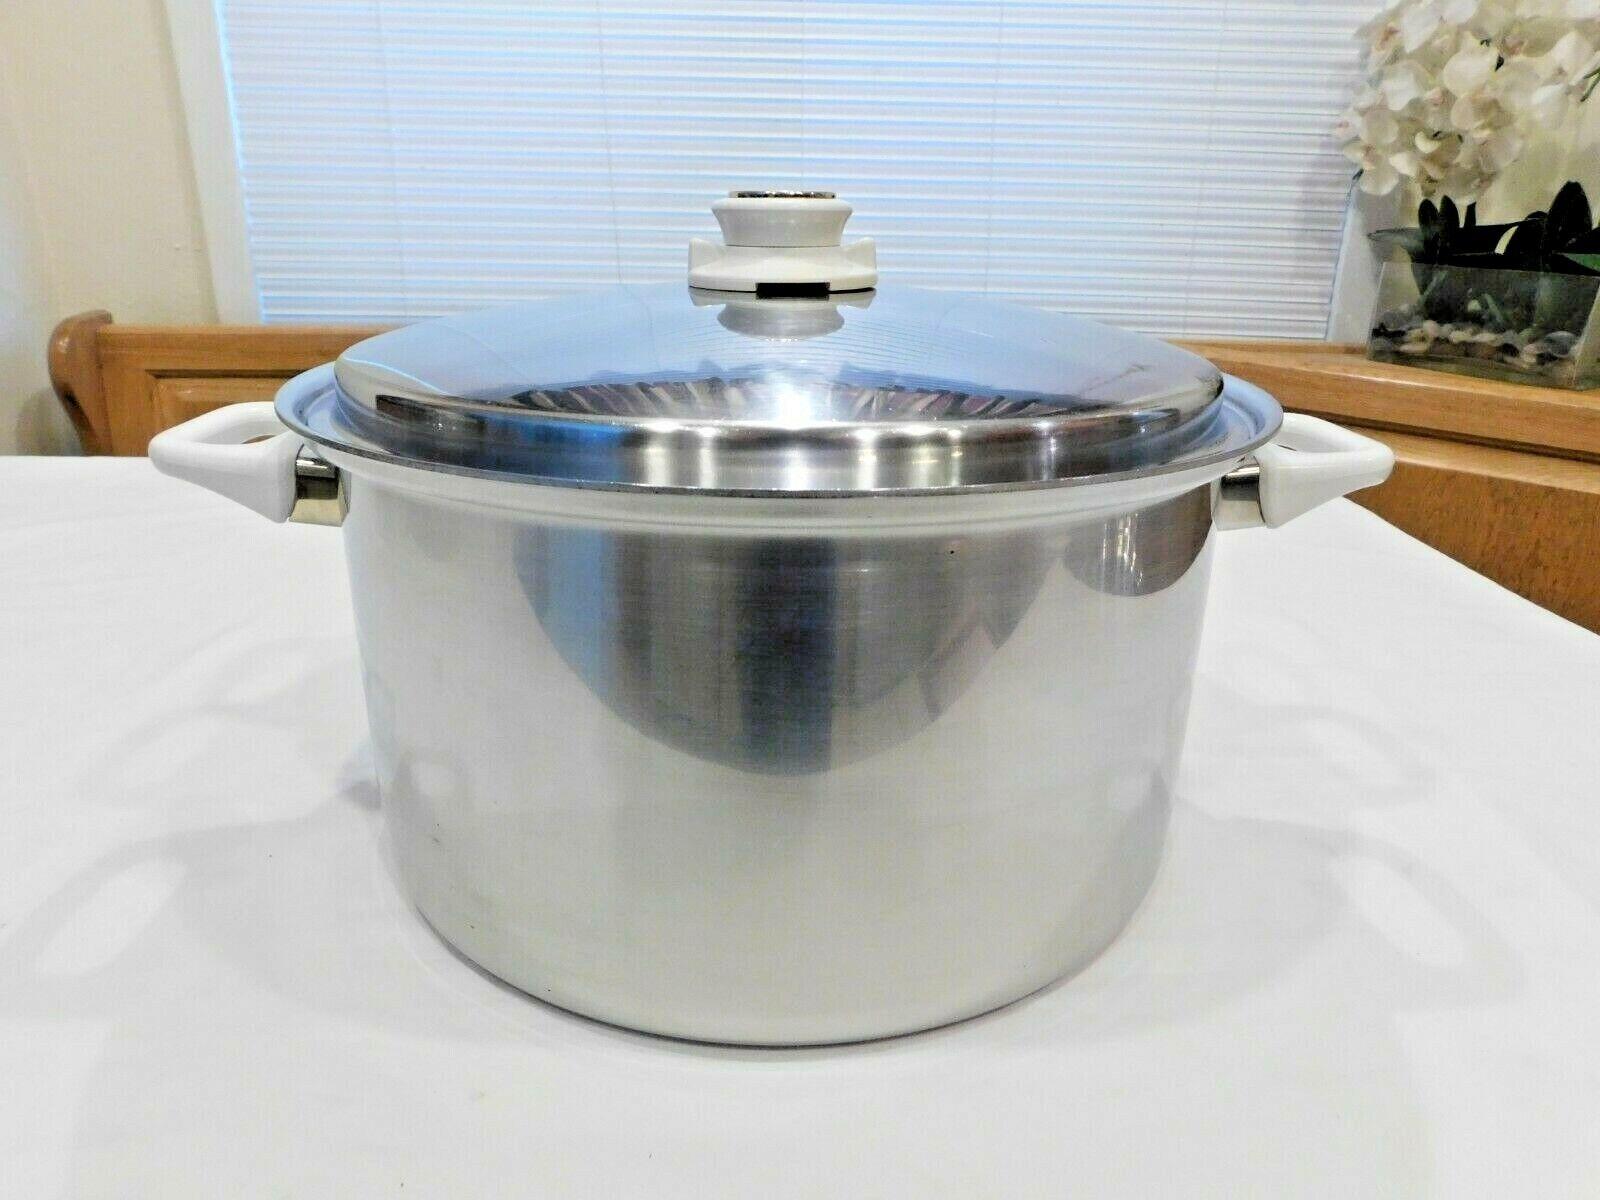 HEALTH CRAFT 12 Qt Faitout 5 plis nicromium or classique WATERLESS Cookware